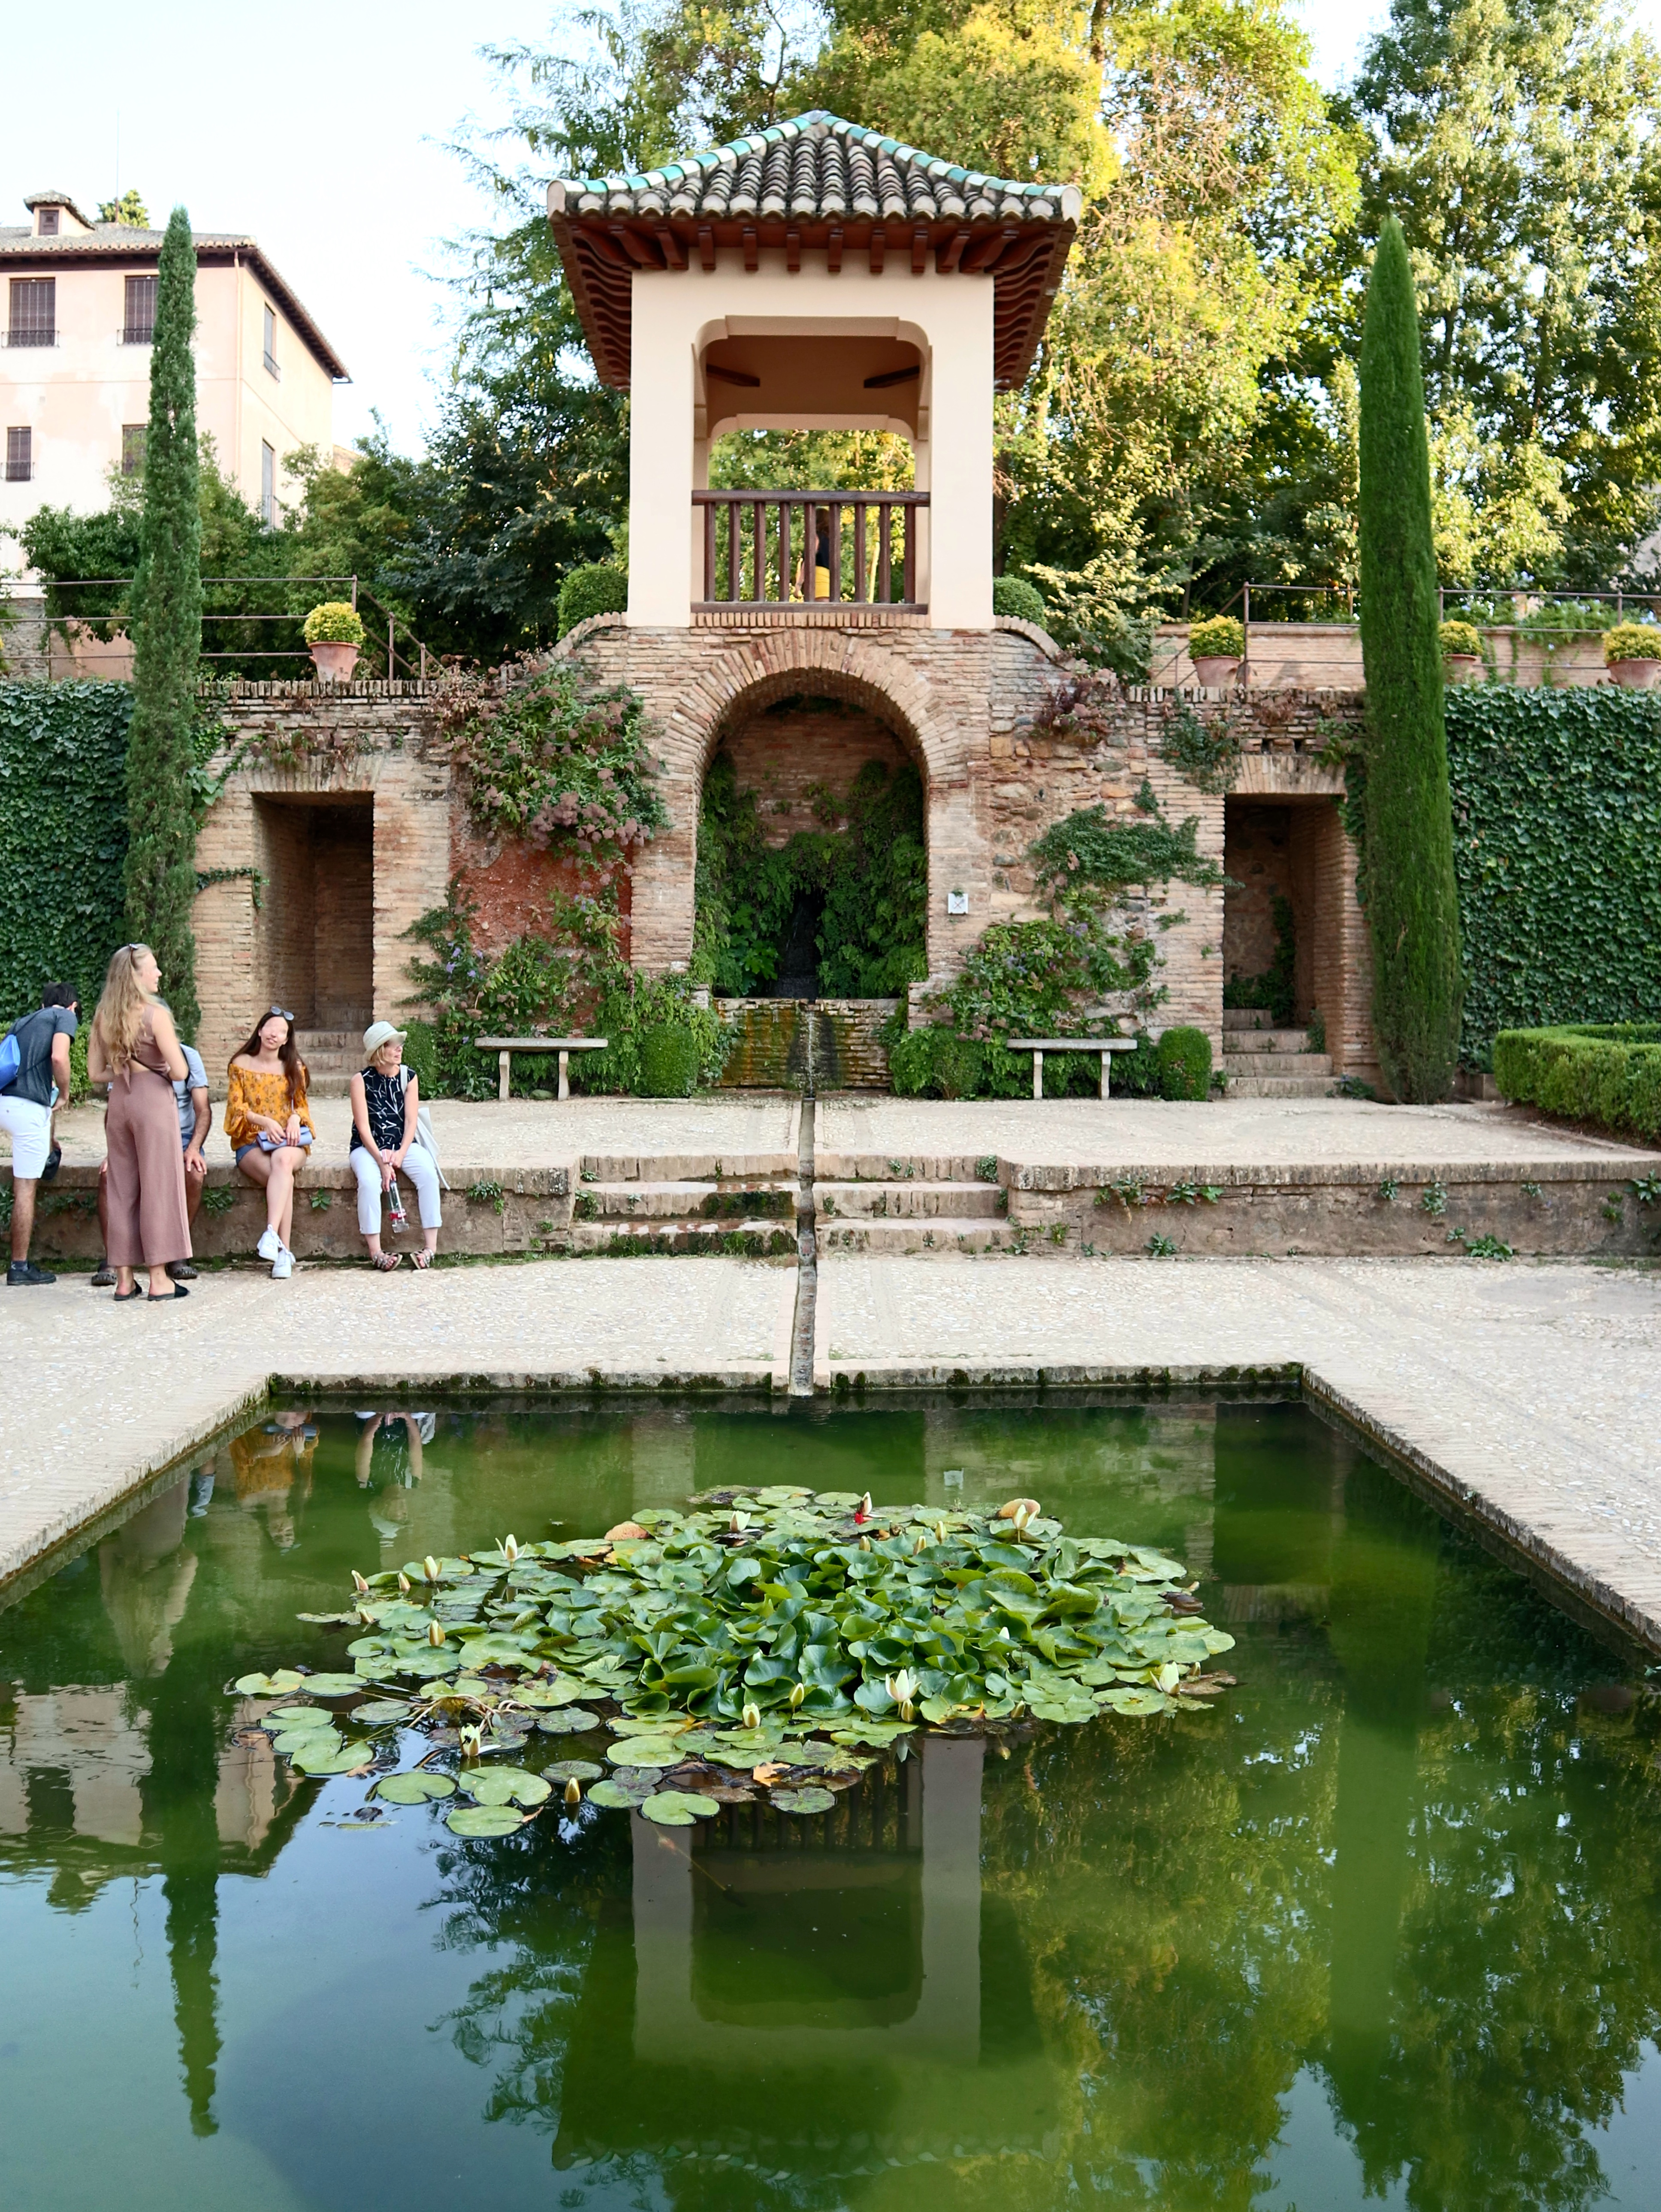 "Granada_Alhambra_JardinesdelPartal_001"""""